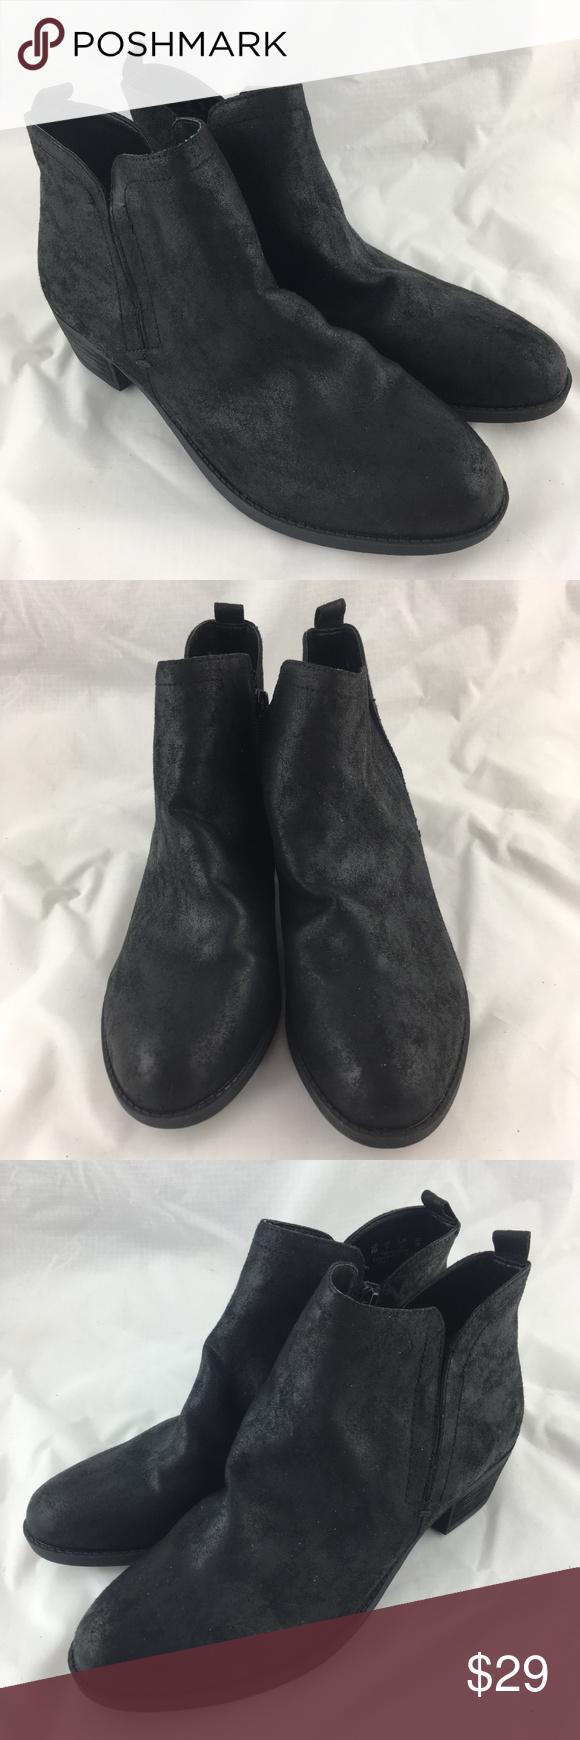 78edb4fc2eb0 Black booties boots ankle short fabric low heel 9 Carlos by Carlos Santana  women s Boe booties